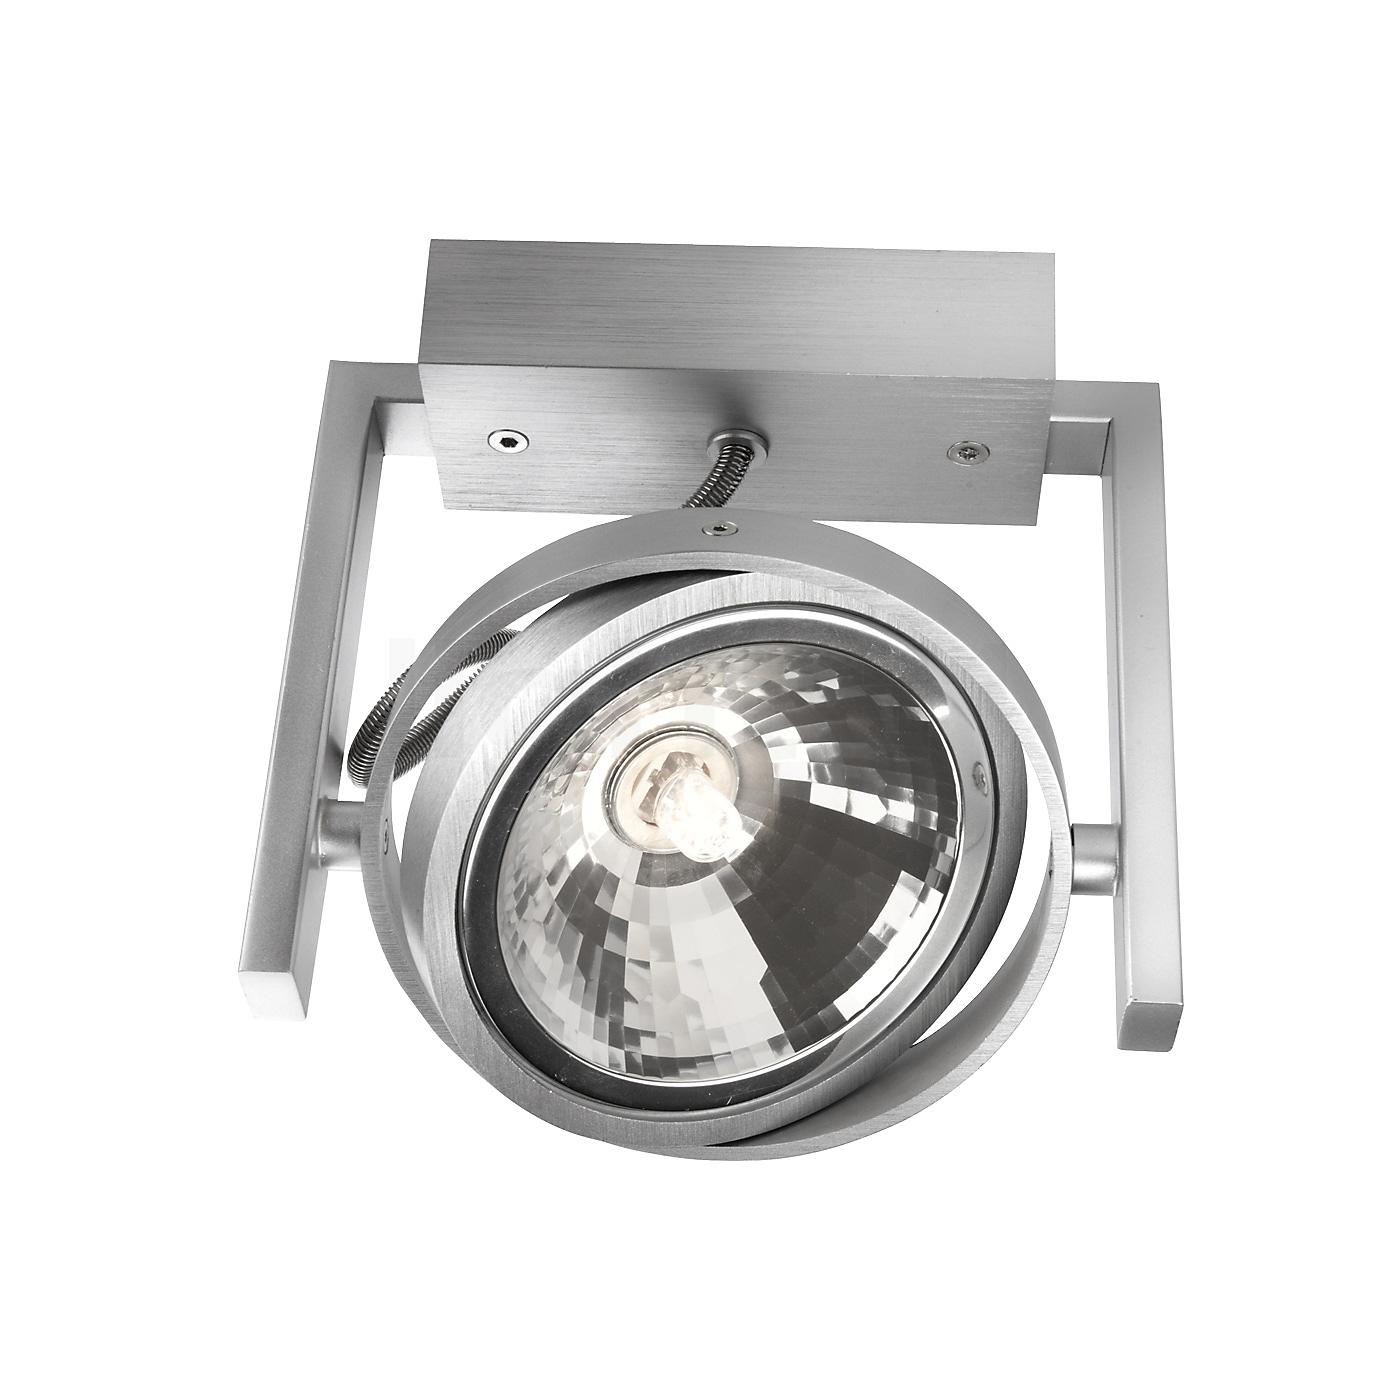 philips myliving spot 53060 spotlights l11 kaufen bei. Black Bedroom Furniture Sets. Home Design Ideas